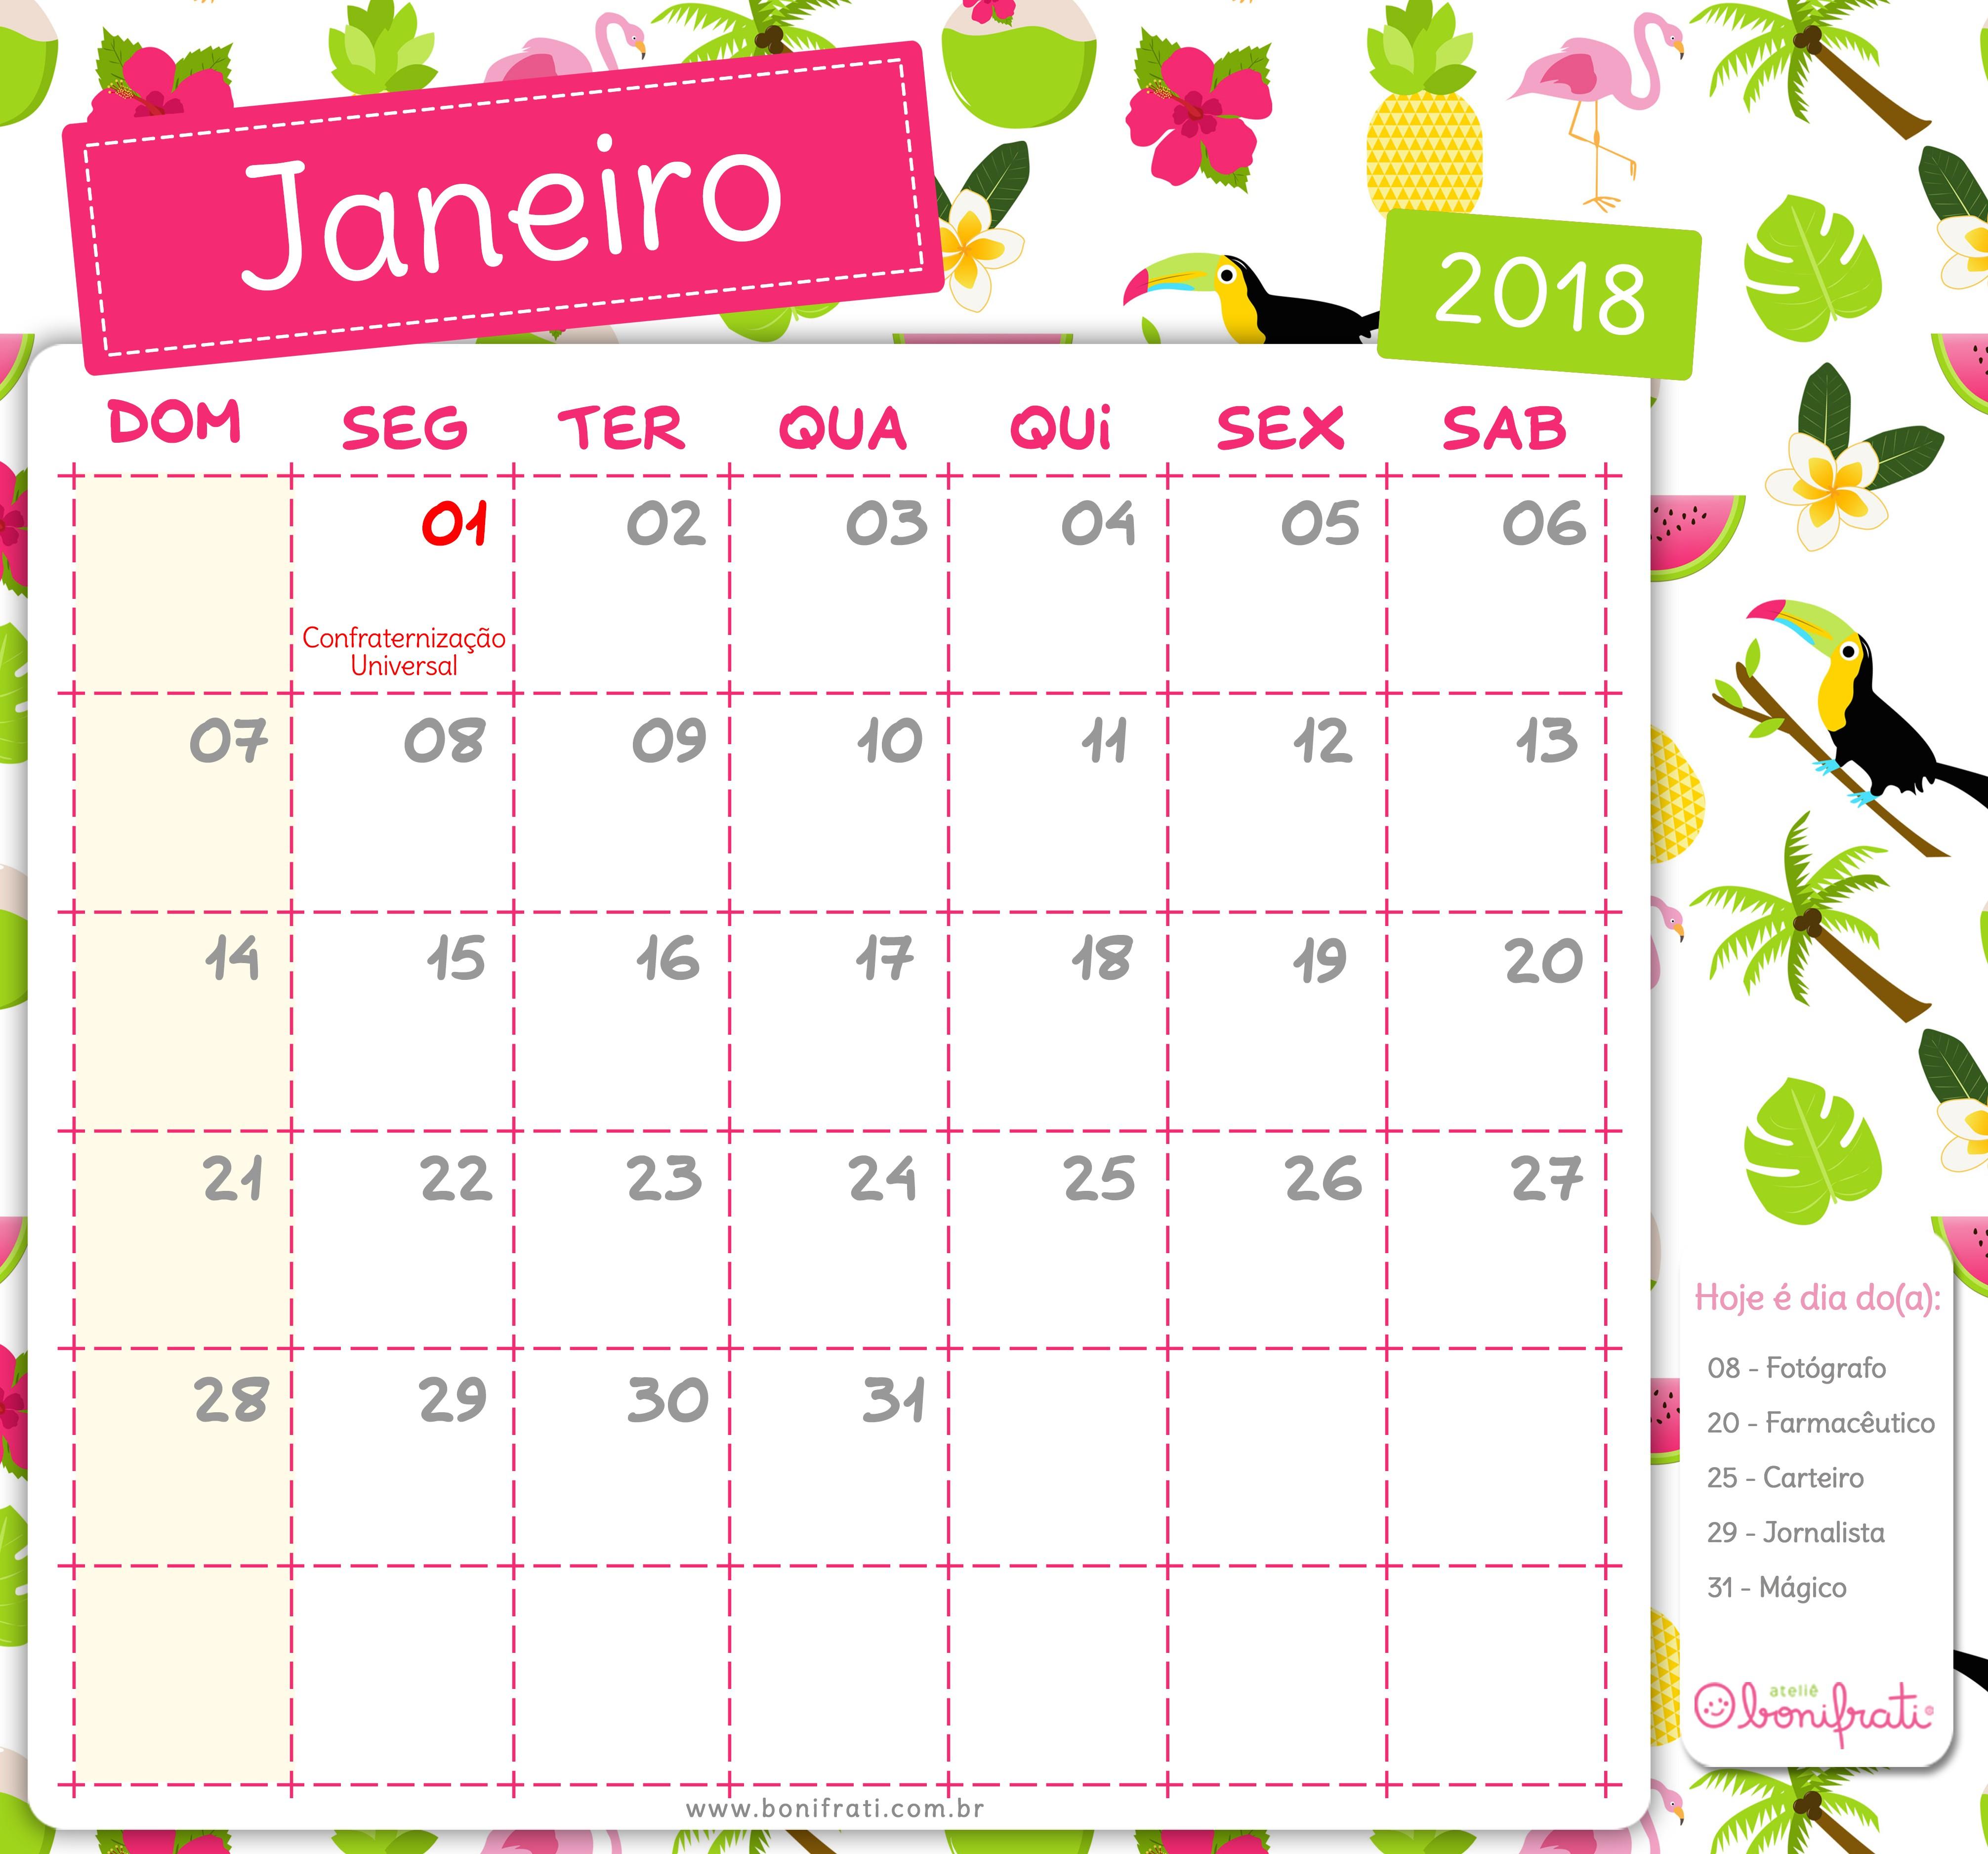 Calendario Para Imprimir Dezembro 2017 Actual Pin De Keila andrade Em Sala De Aula